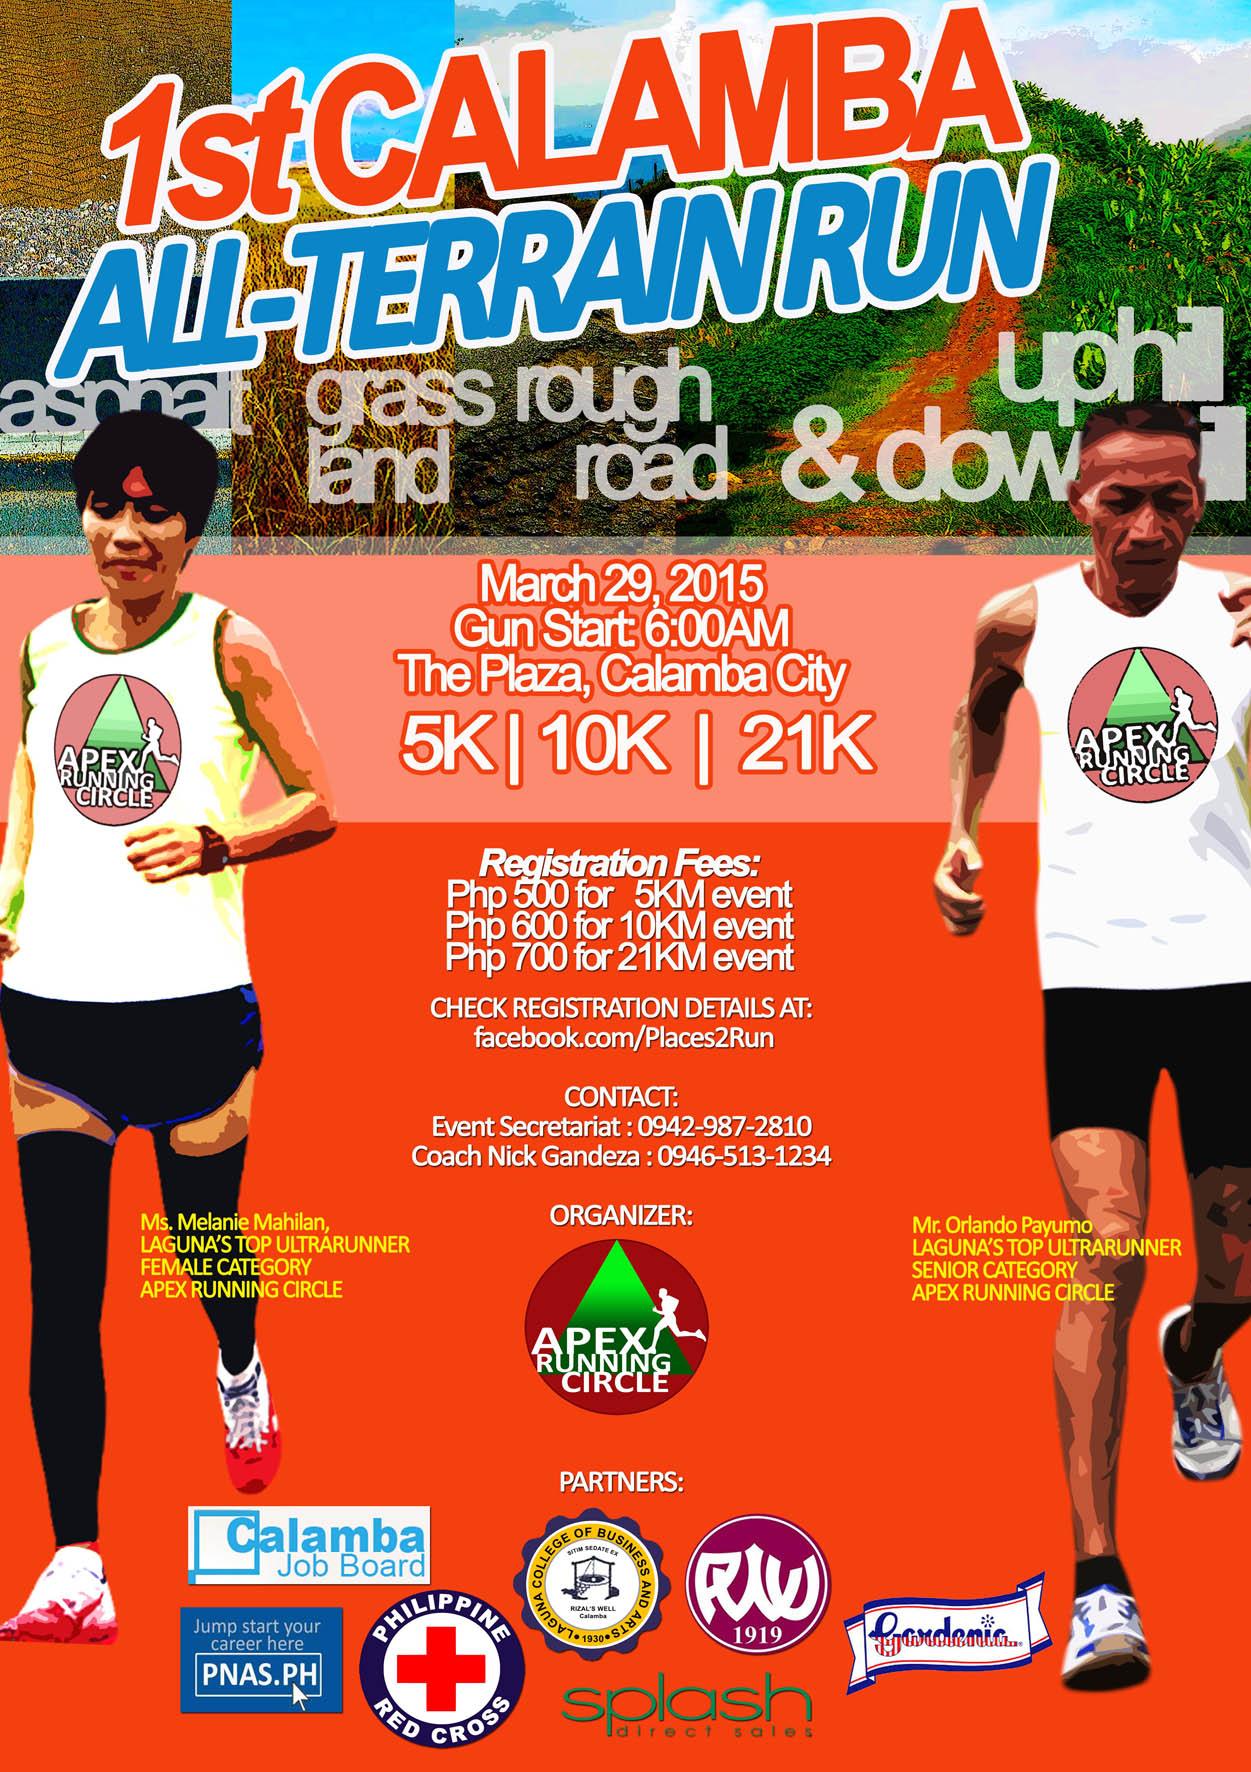 http://www.pinoyfitness.com/wp-content/uploads/2015/01/1st-Calamba-All-Terrain-Run-Poster.jpg